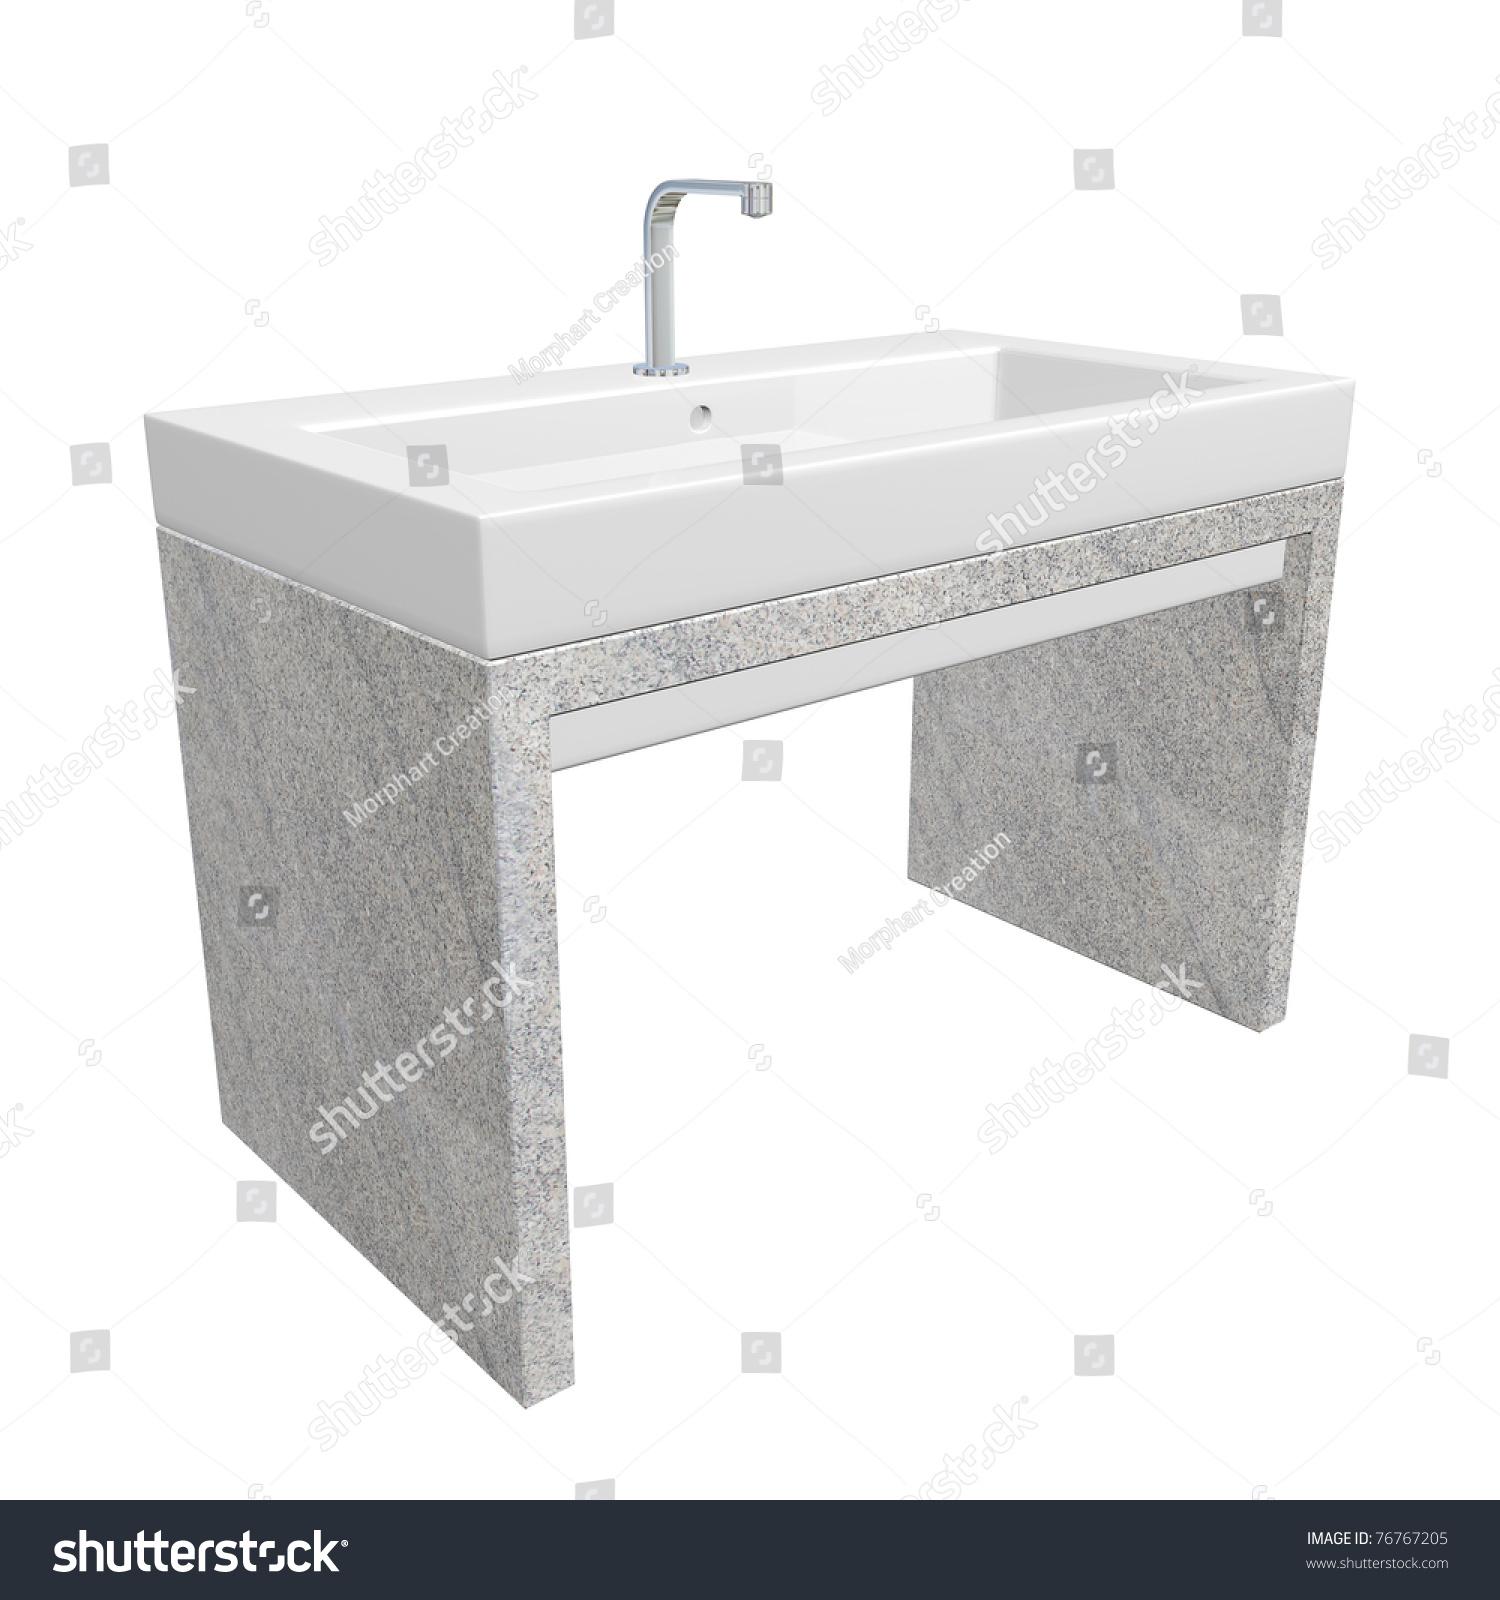 Modern Washroom Sink Set Ceramic Acrylic Stock Illustration 76767205 ...